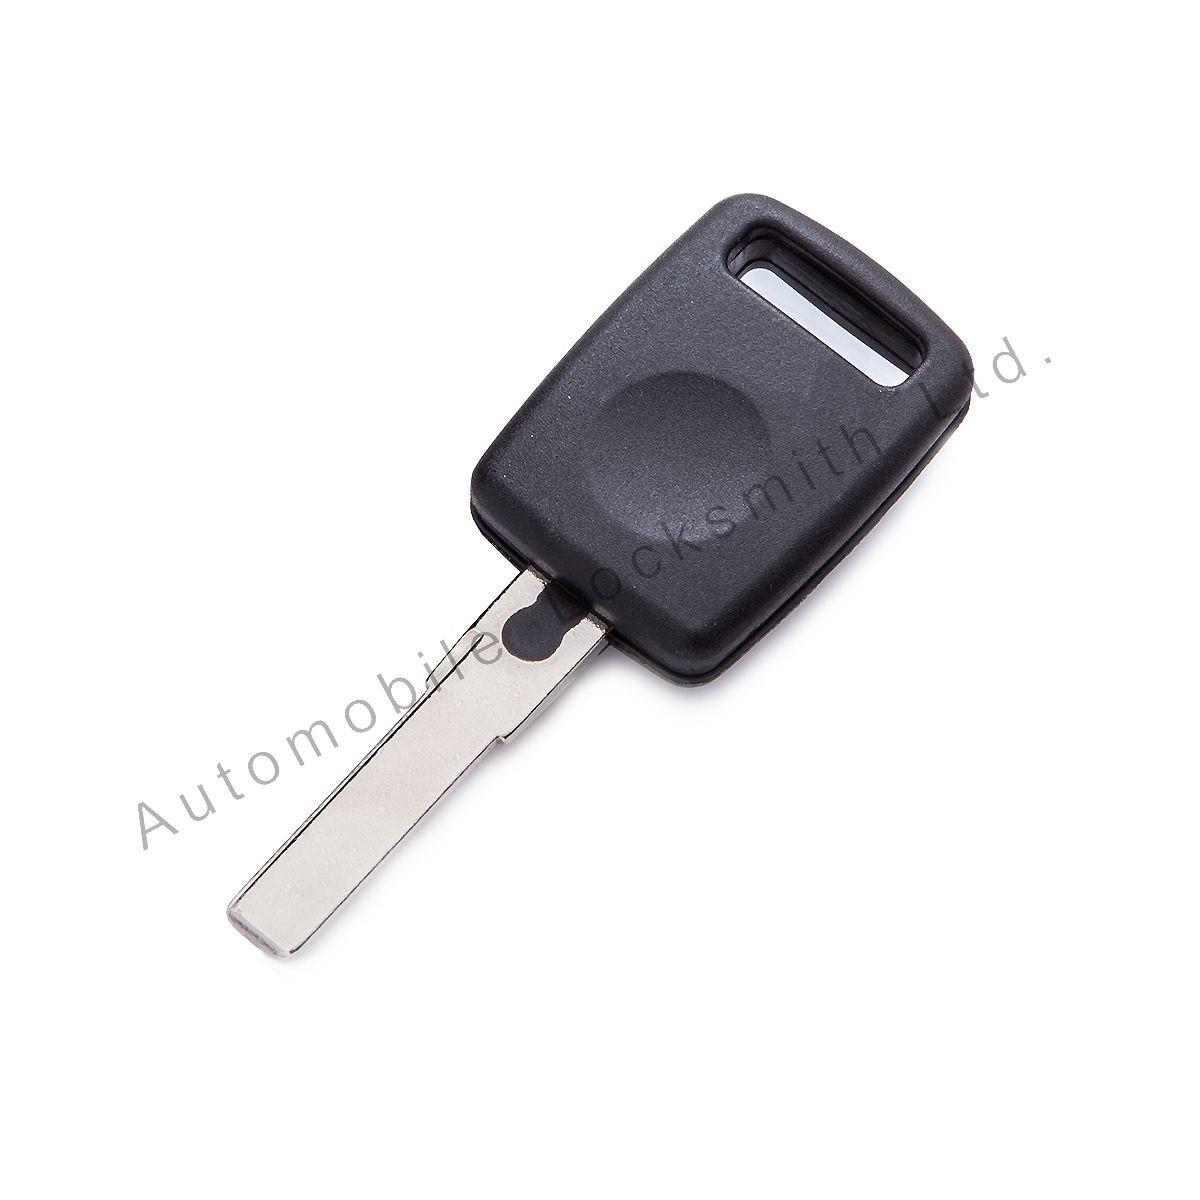 For Audi transponder key blank